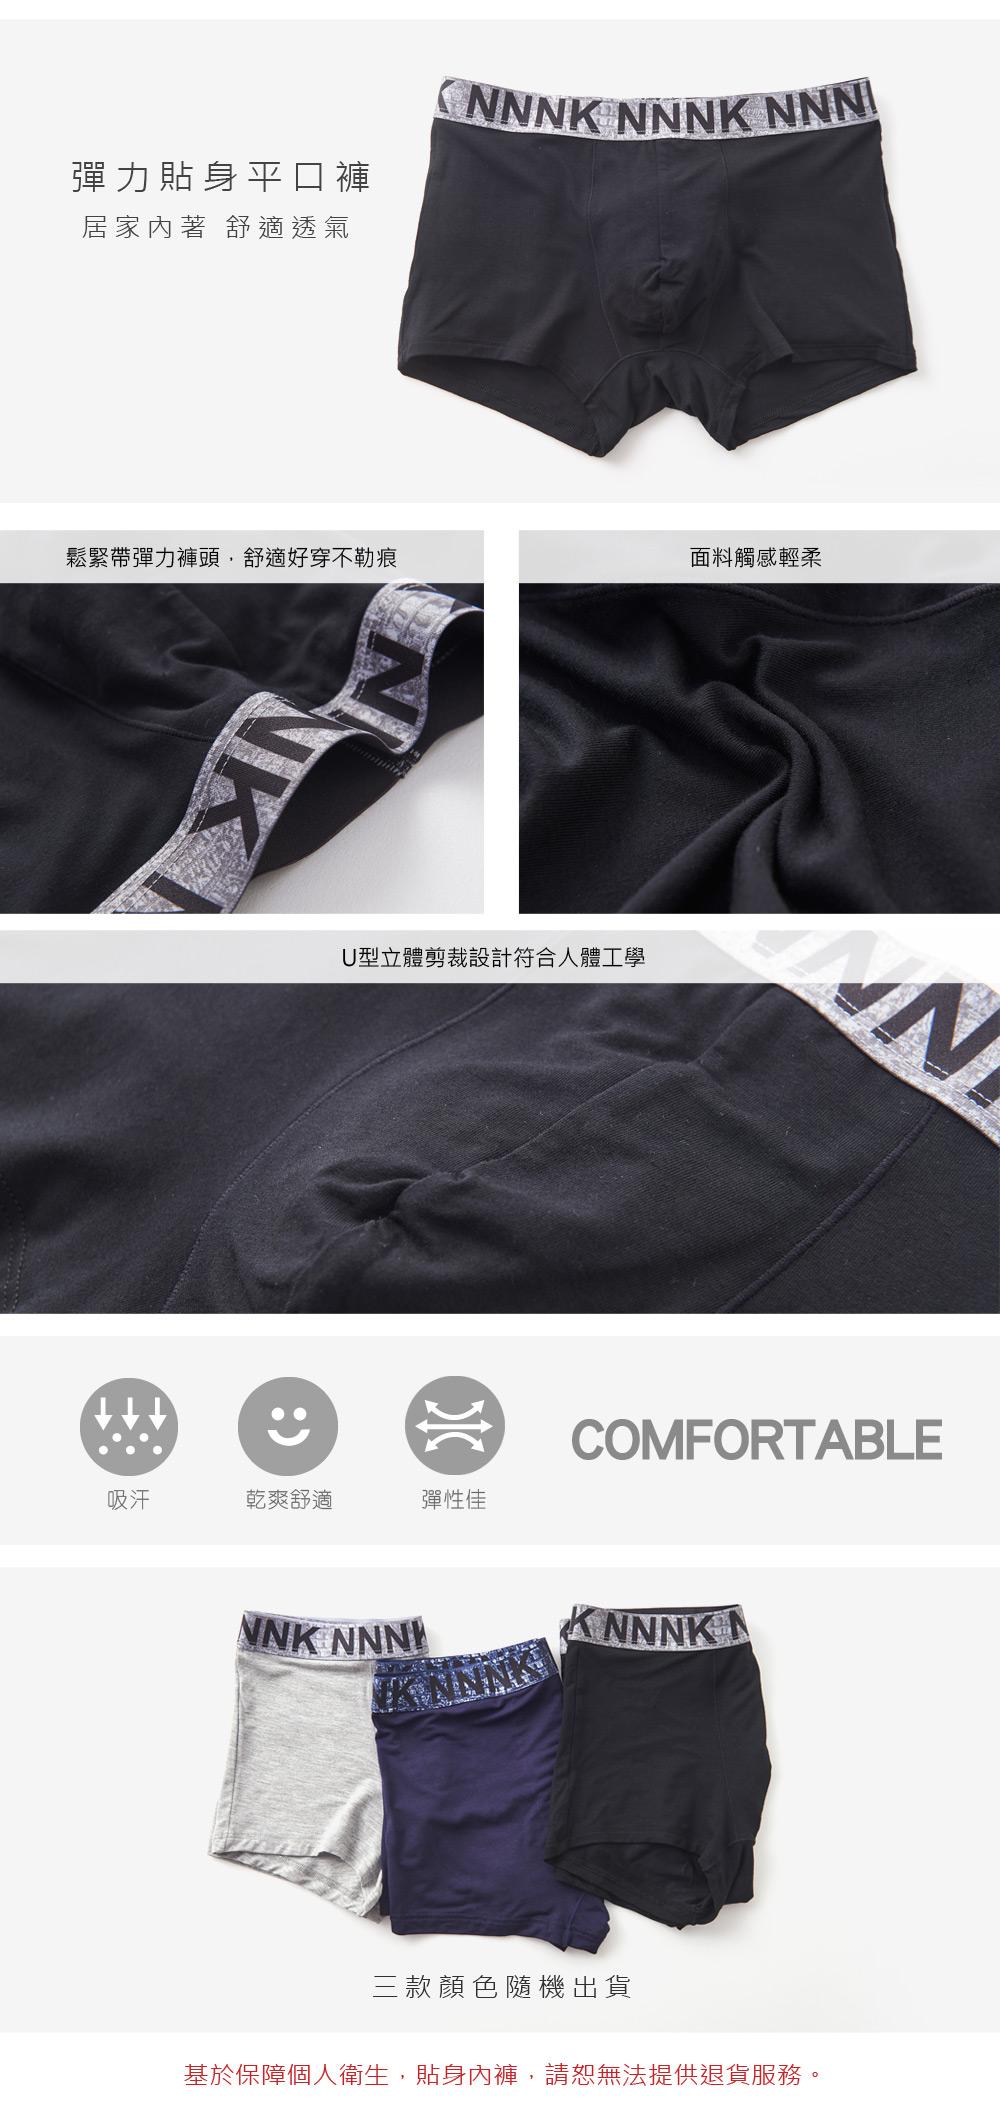 NK彈利貼身平口褲-02